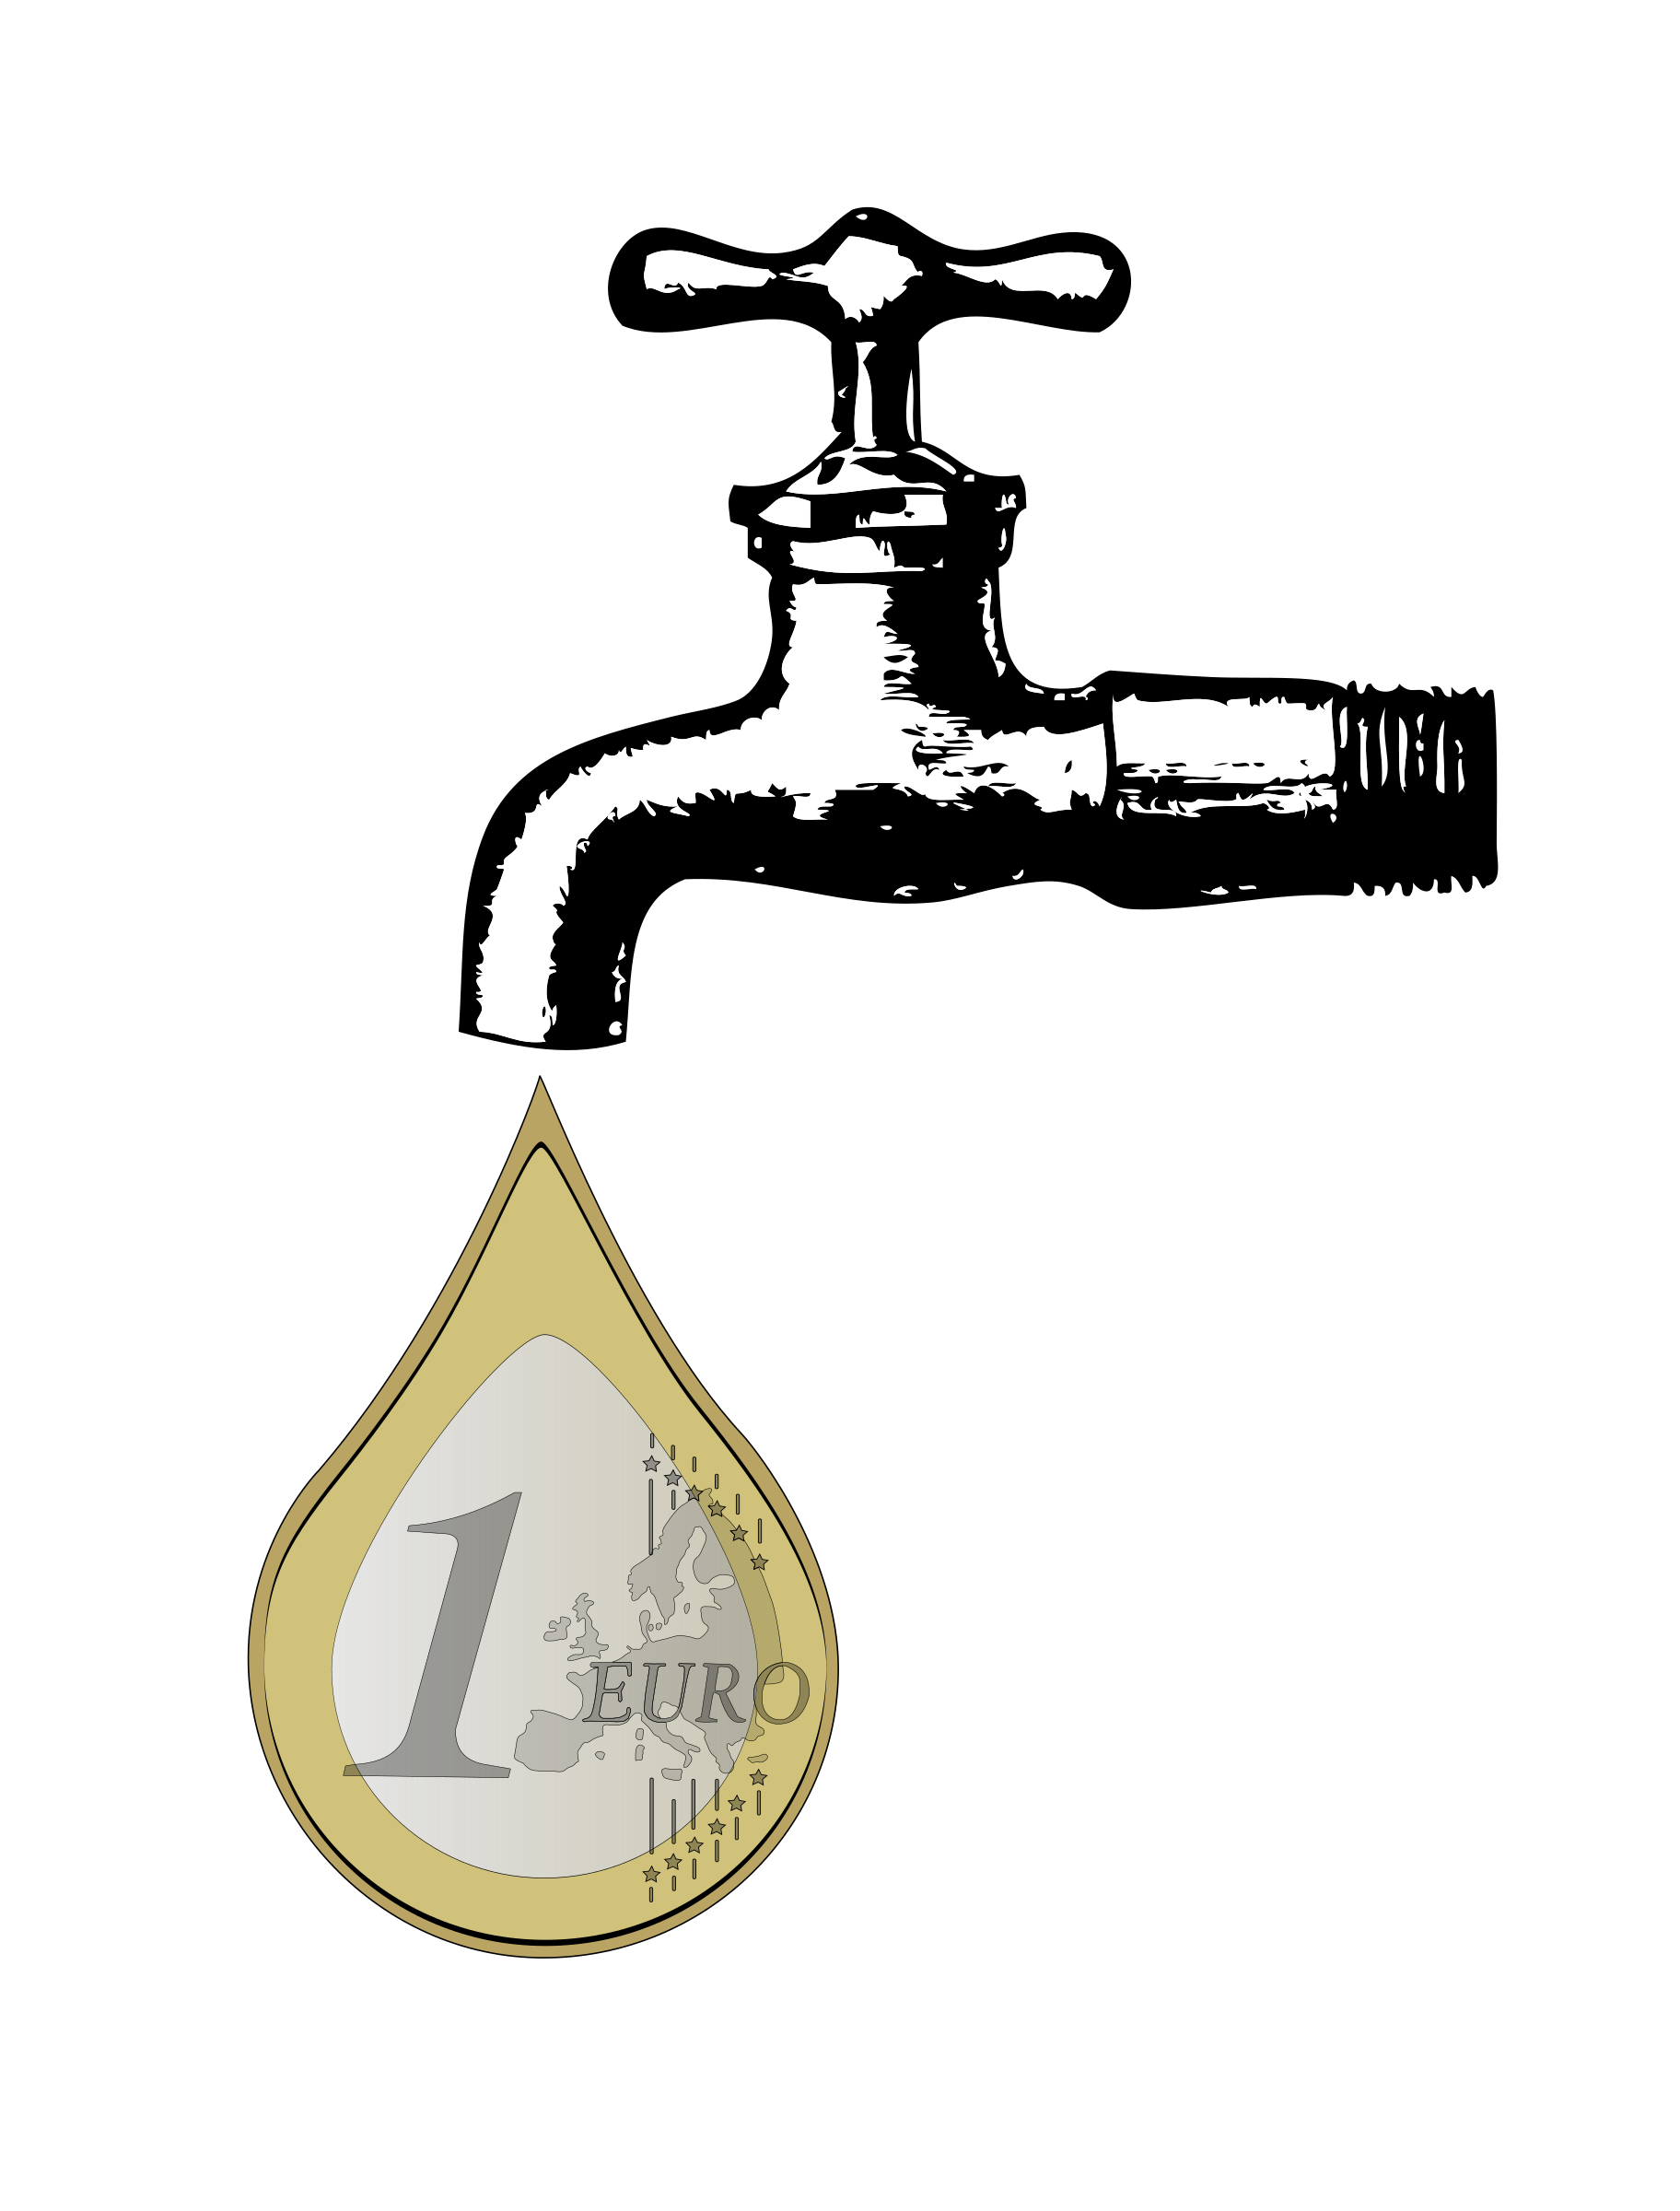 Euro drop. Faucet clipart water drawing